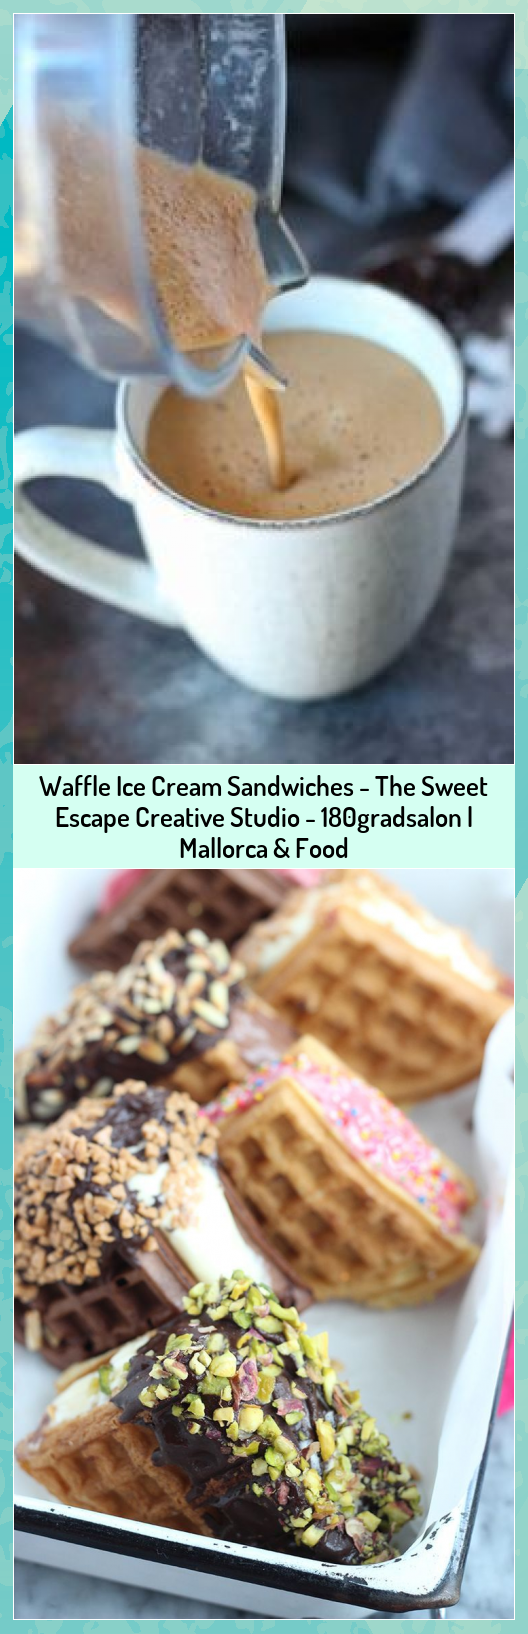 Waffle Ice Cream Sandwiches - The Sweet Escape Creative Studio - 180gradsalon   Mallorca & Food #180gradsalon #Cream #Creative #Escape #Food #Ice #Mallorca #sandwiches #Studio #Sweet #Waffle